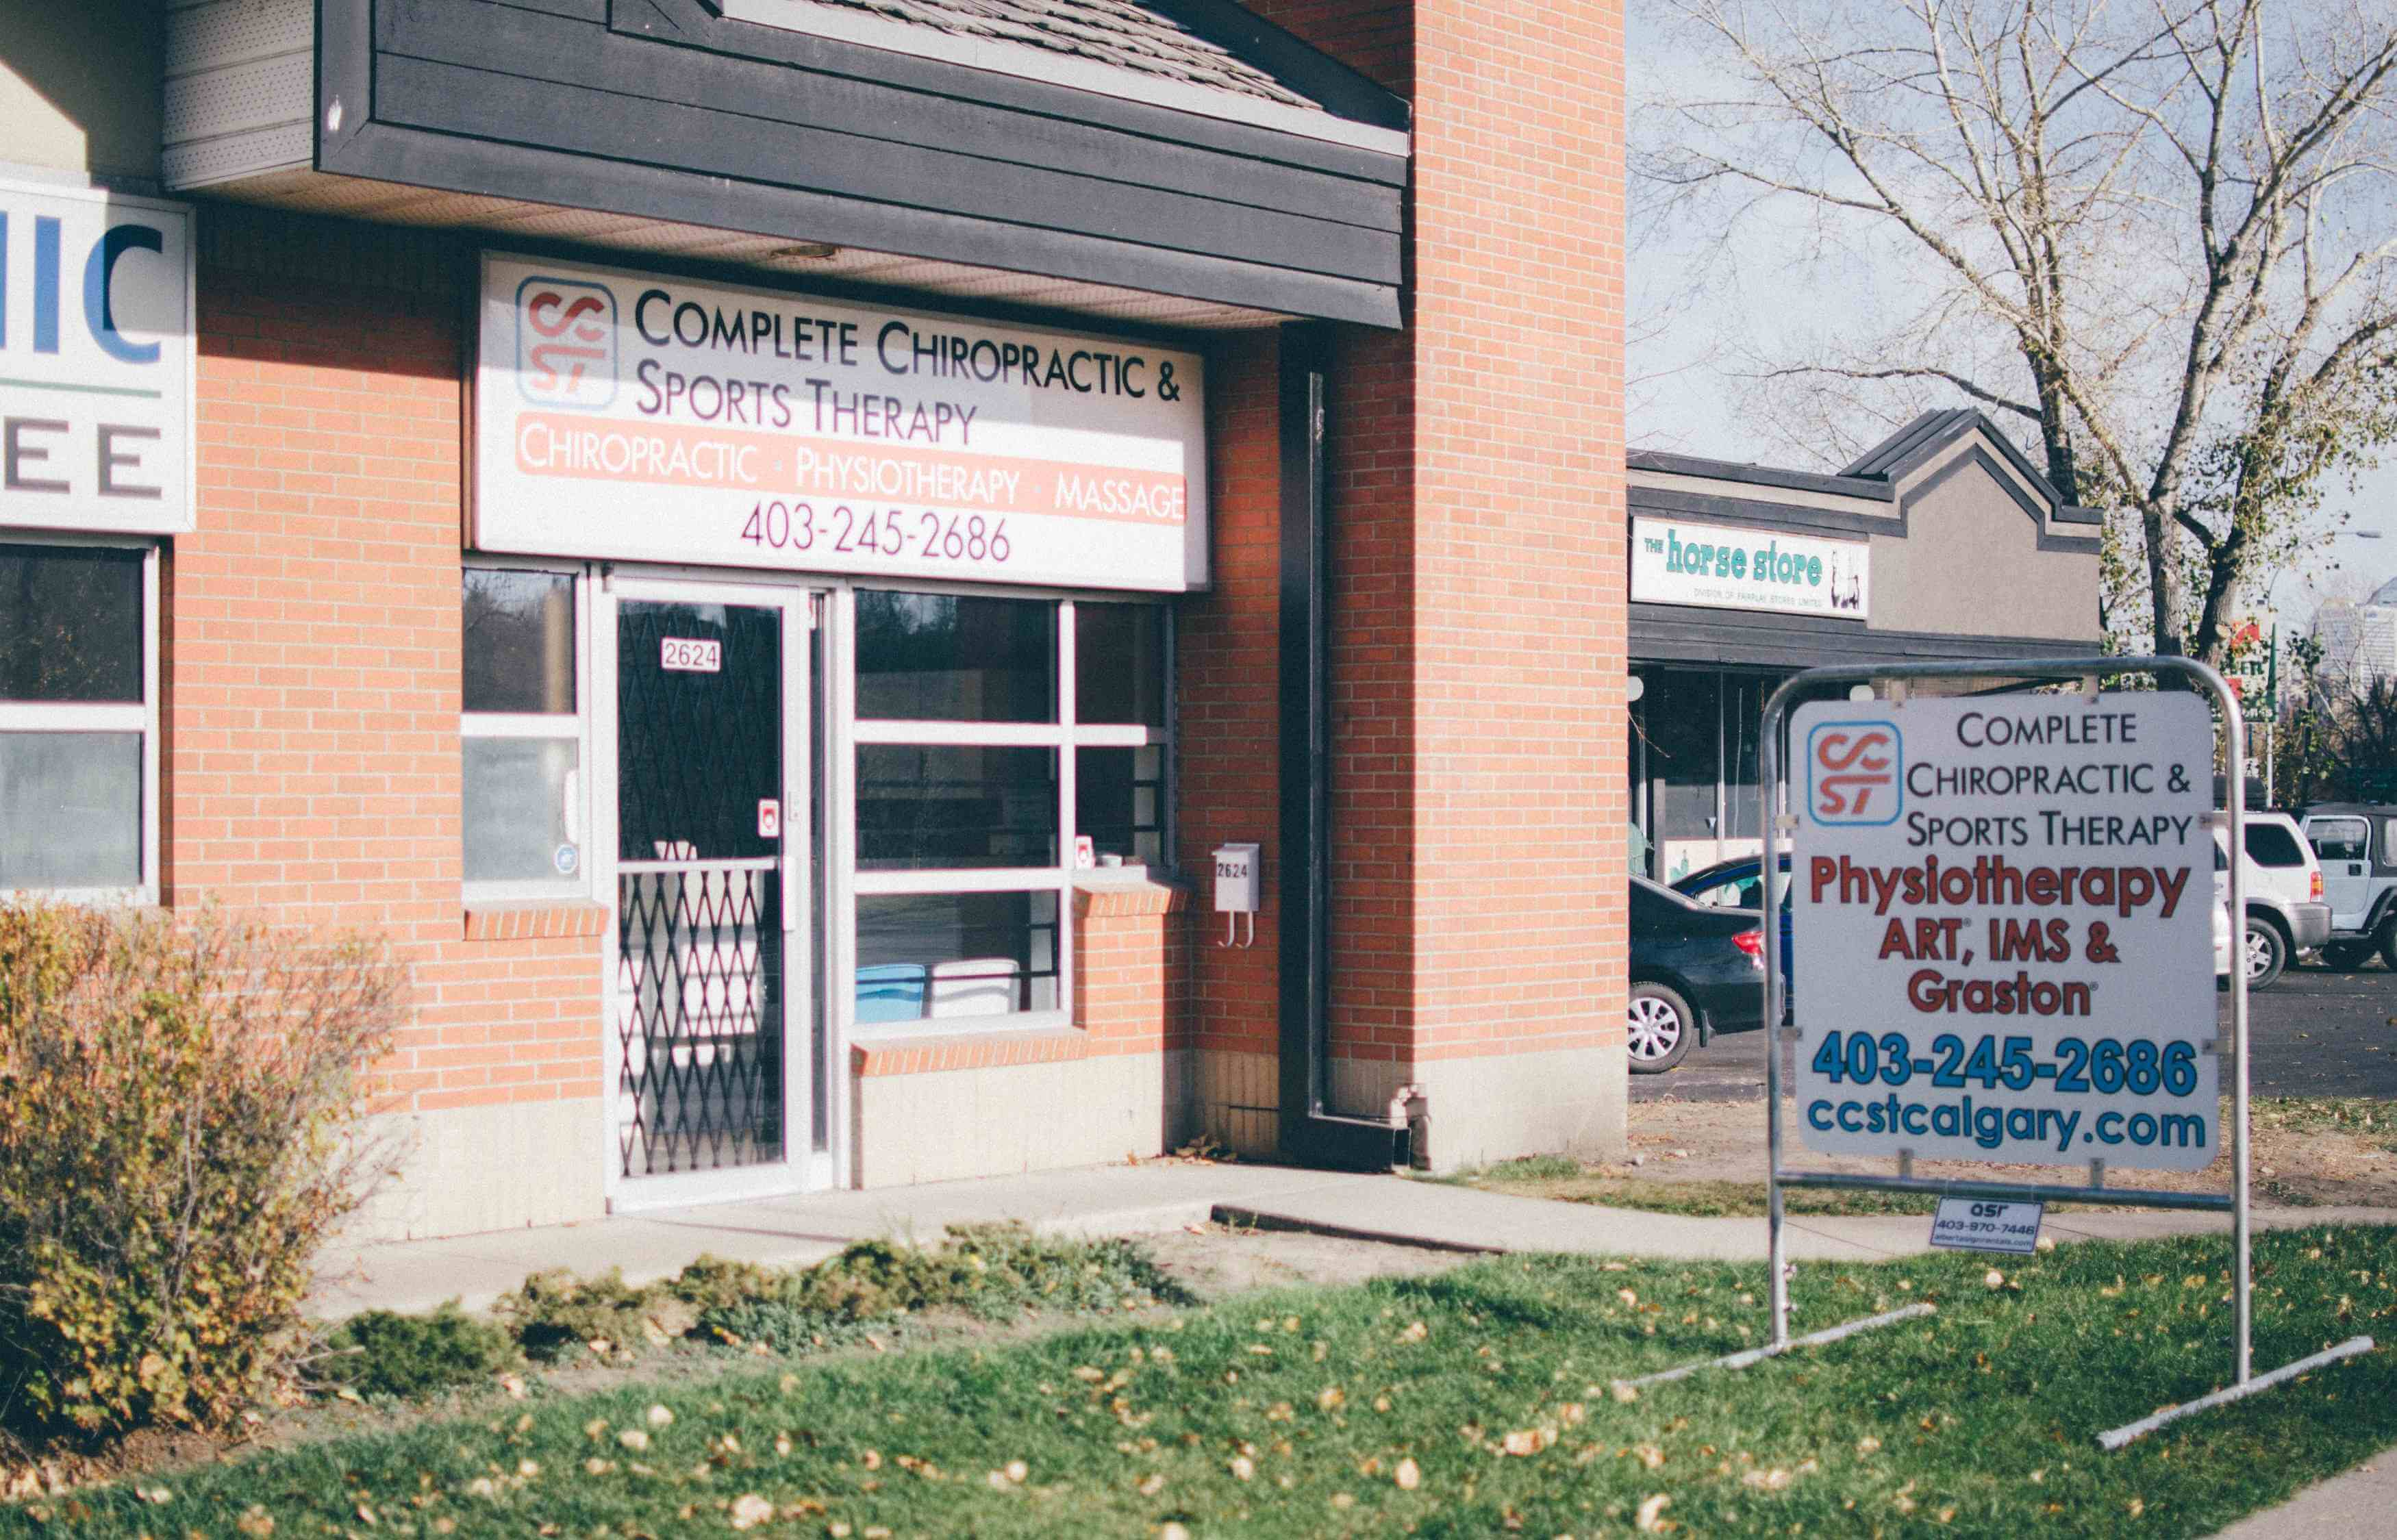 CCST-clinic-NW-Calgary-chiro-physio-massage